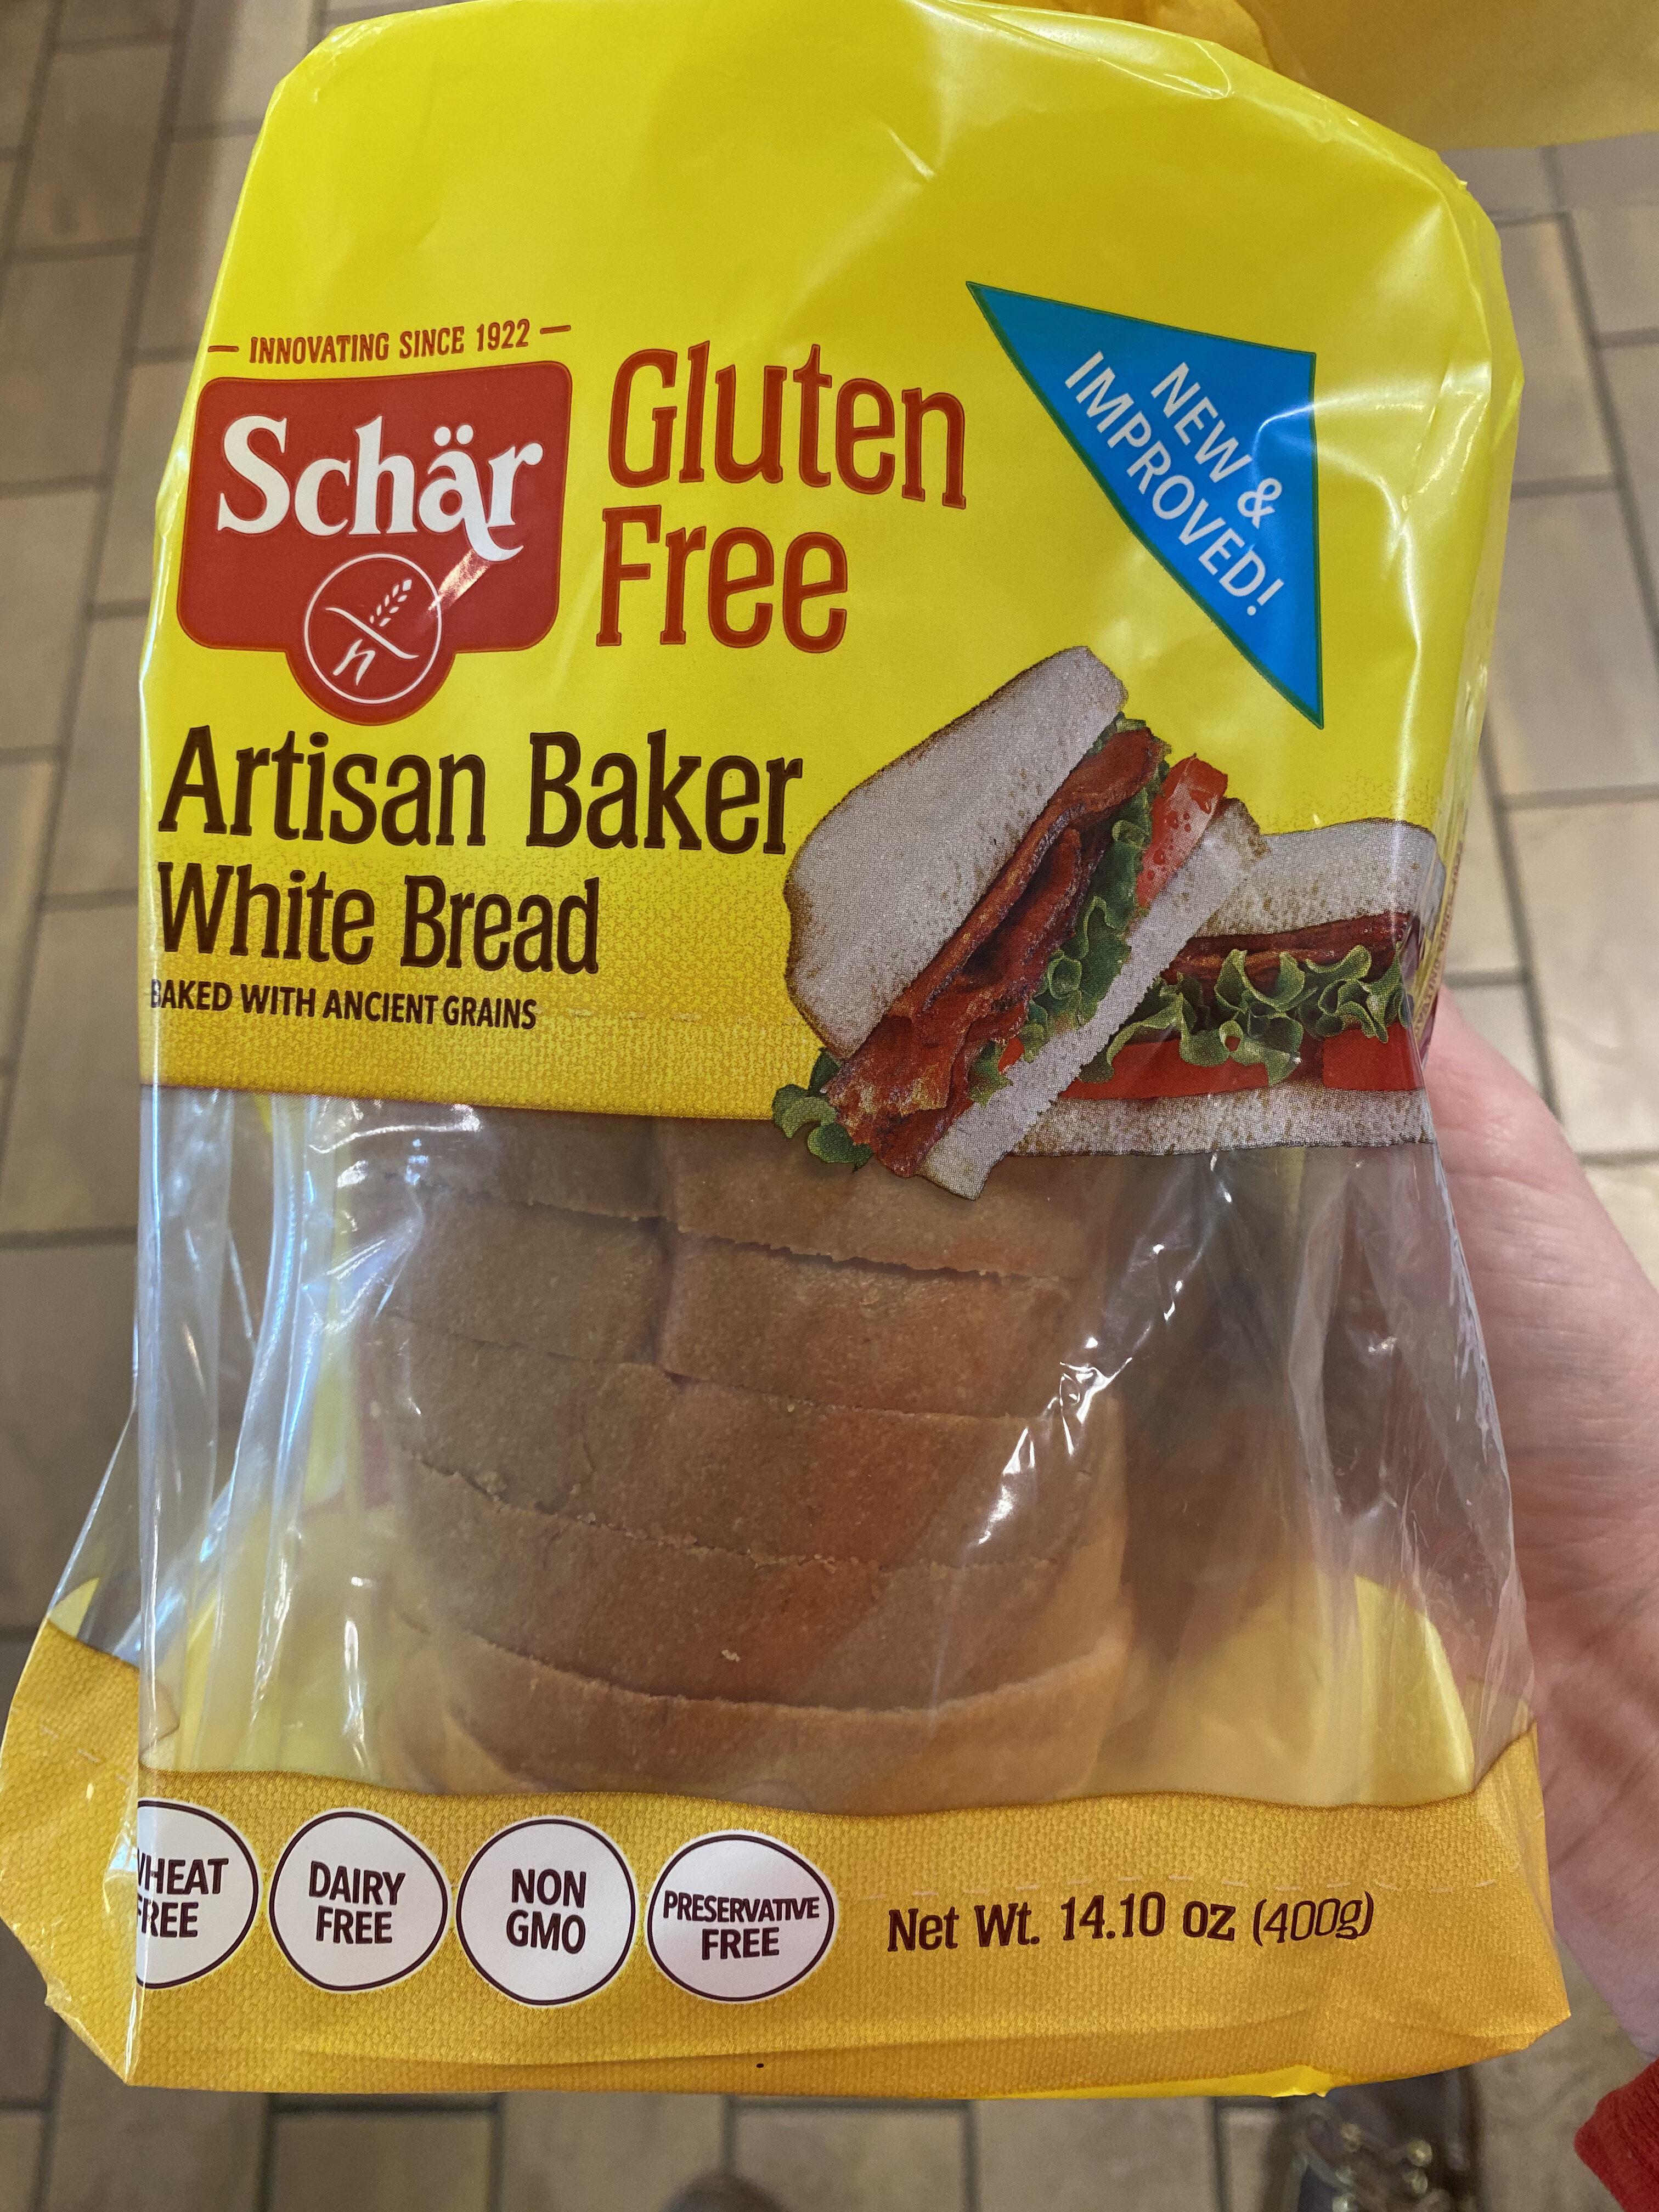 Gluten free artisan baker white bread - Product - en